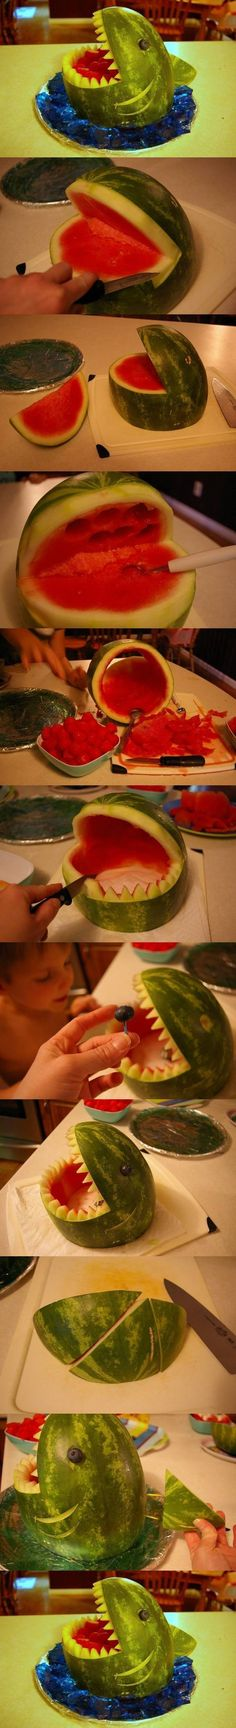 diy, watermelon carving, internet tutorial, shark